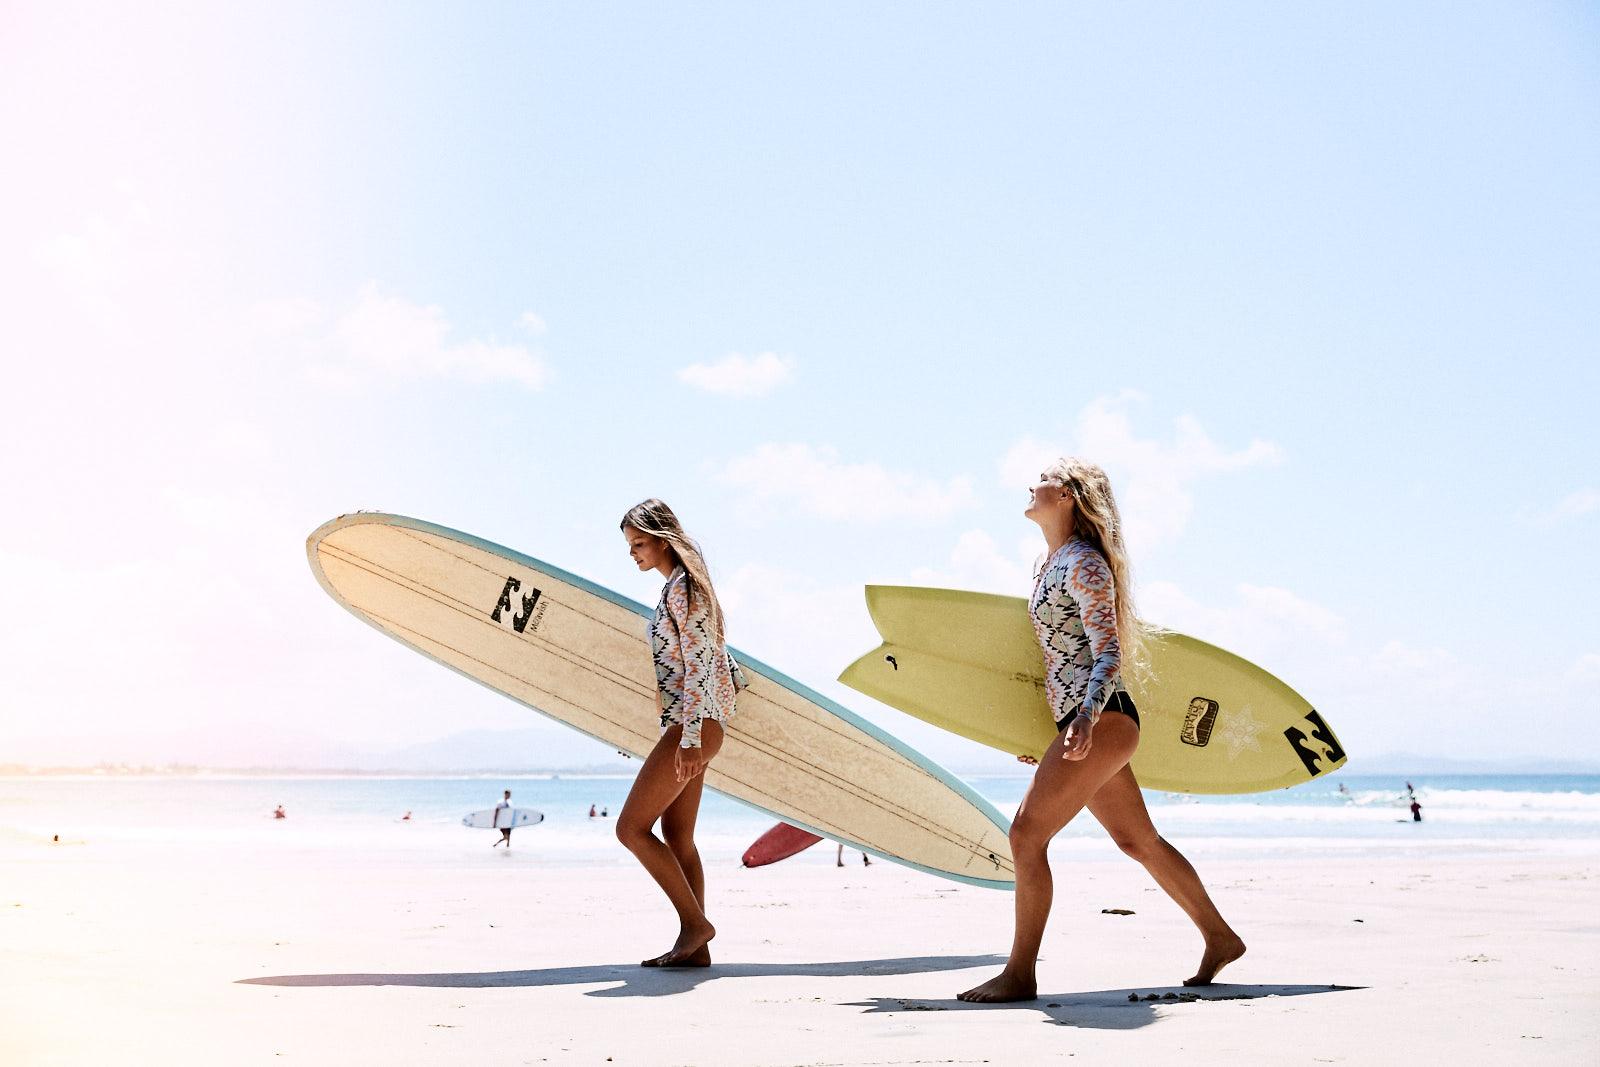 girl-surfer-movie